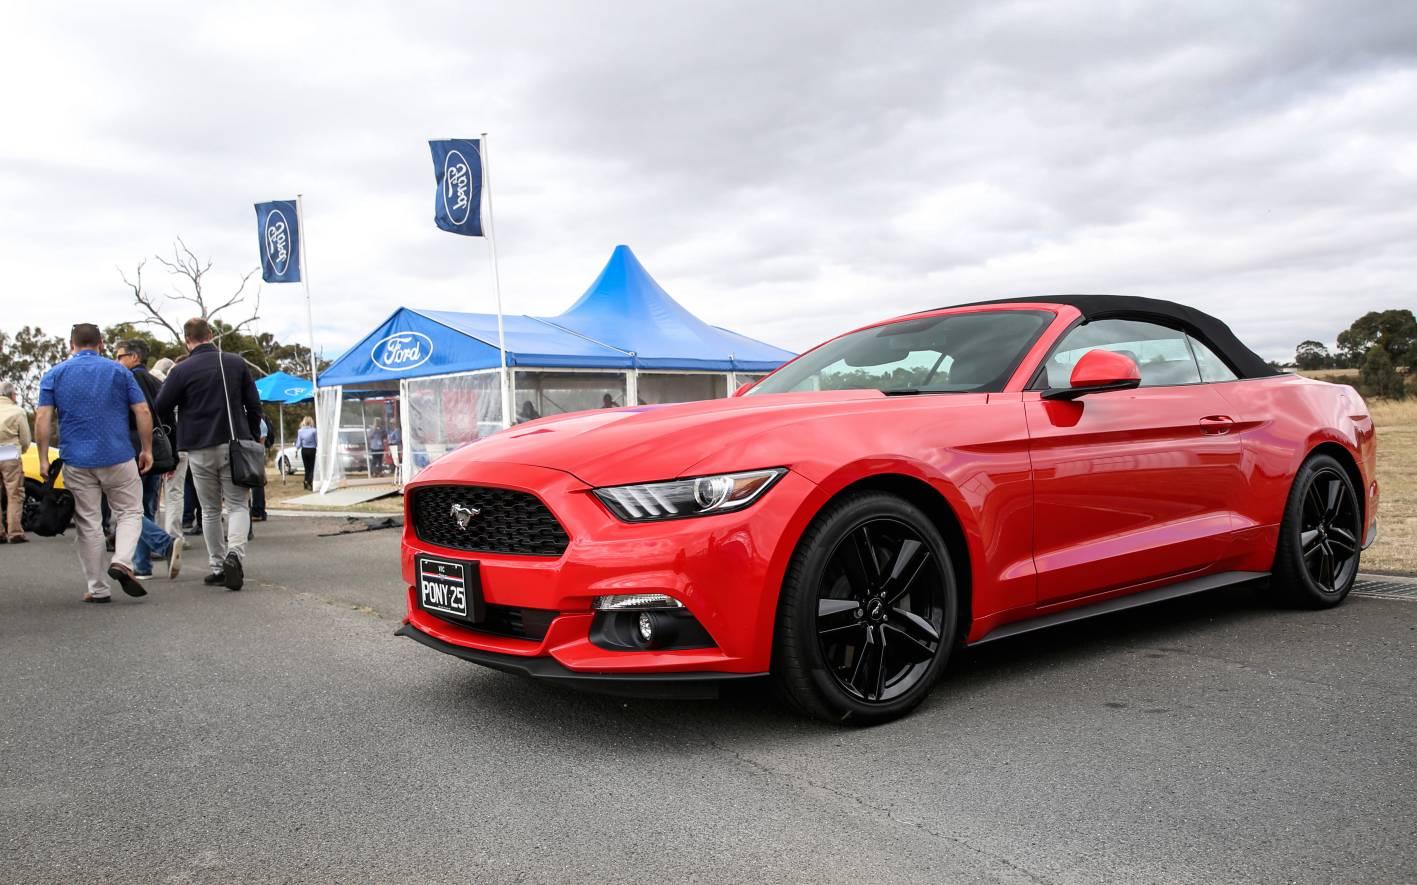 Ford S Lara Proving Ground Celebrates 50th Anniversary